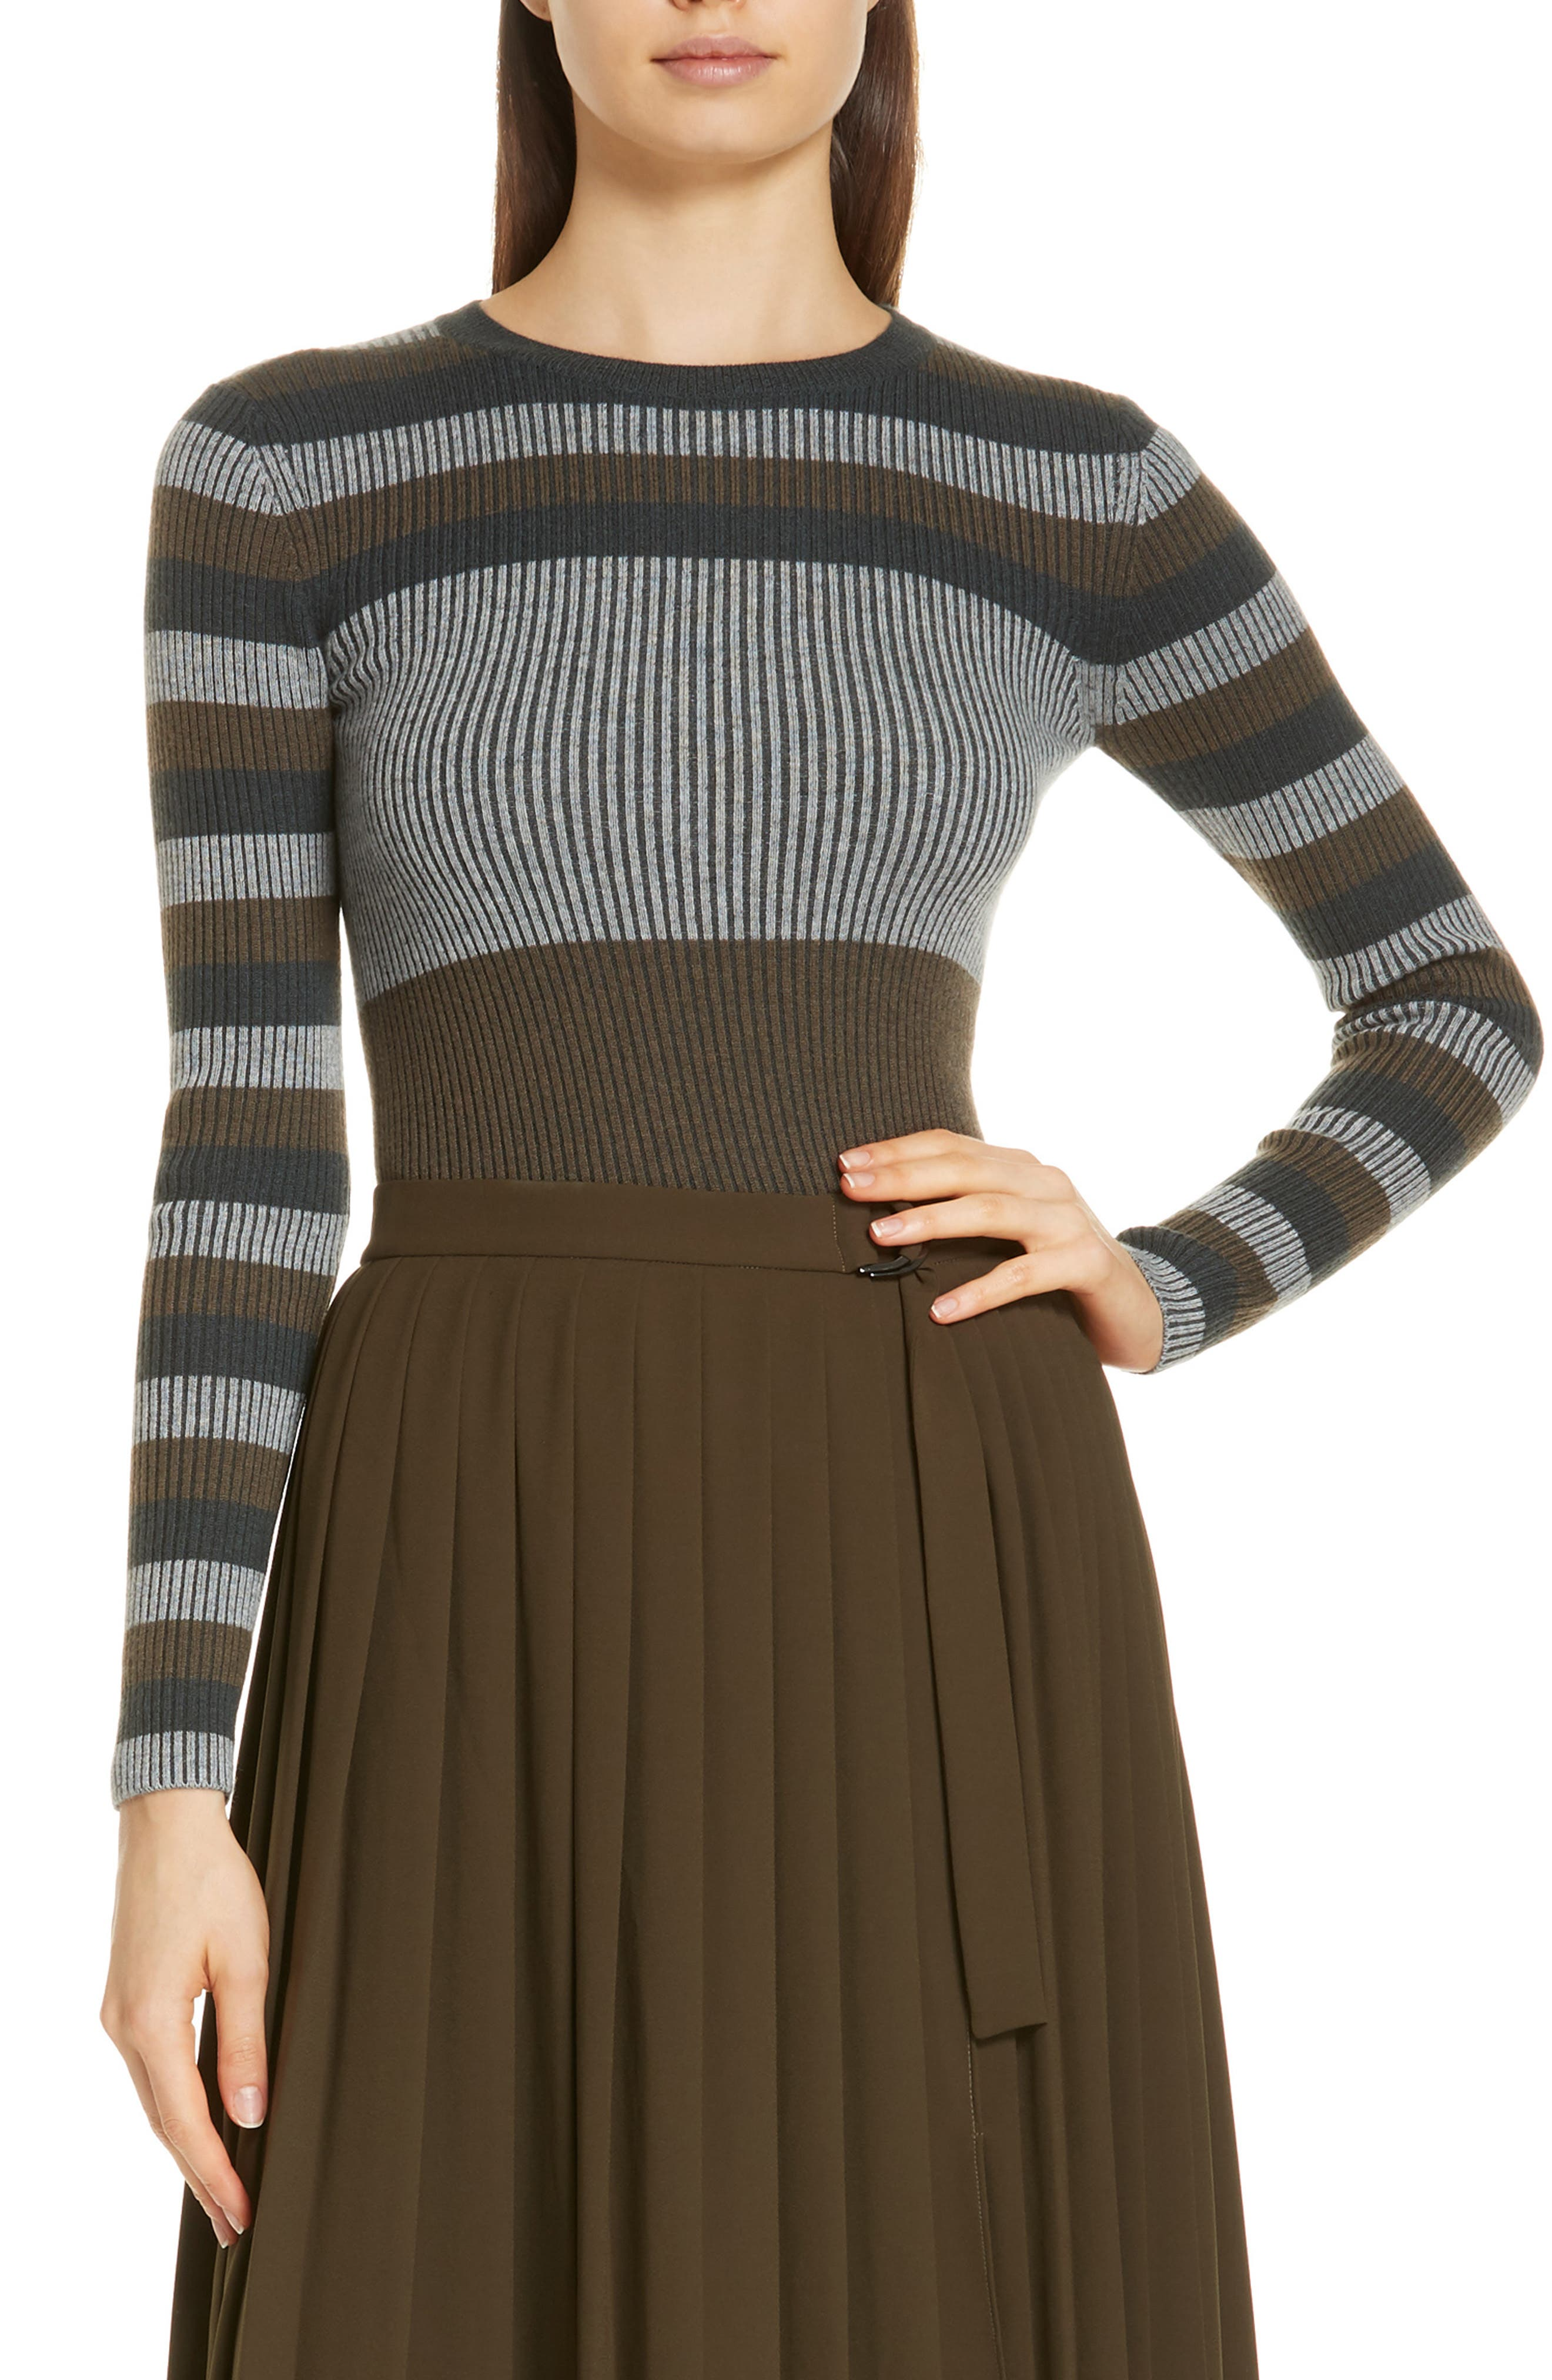 NORDSTROM SIGNATURE Stripe Cashmere Sweater, Main, color, 315